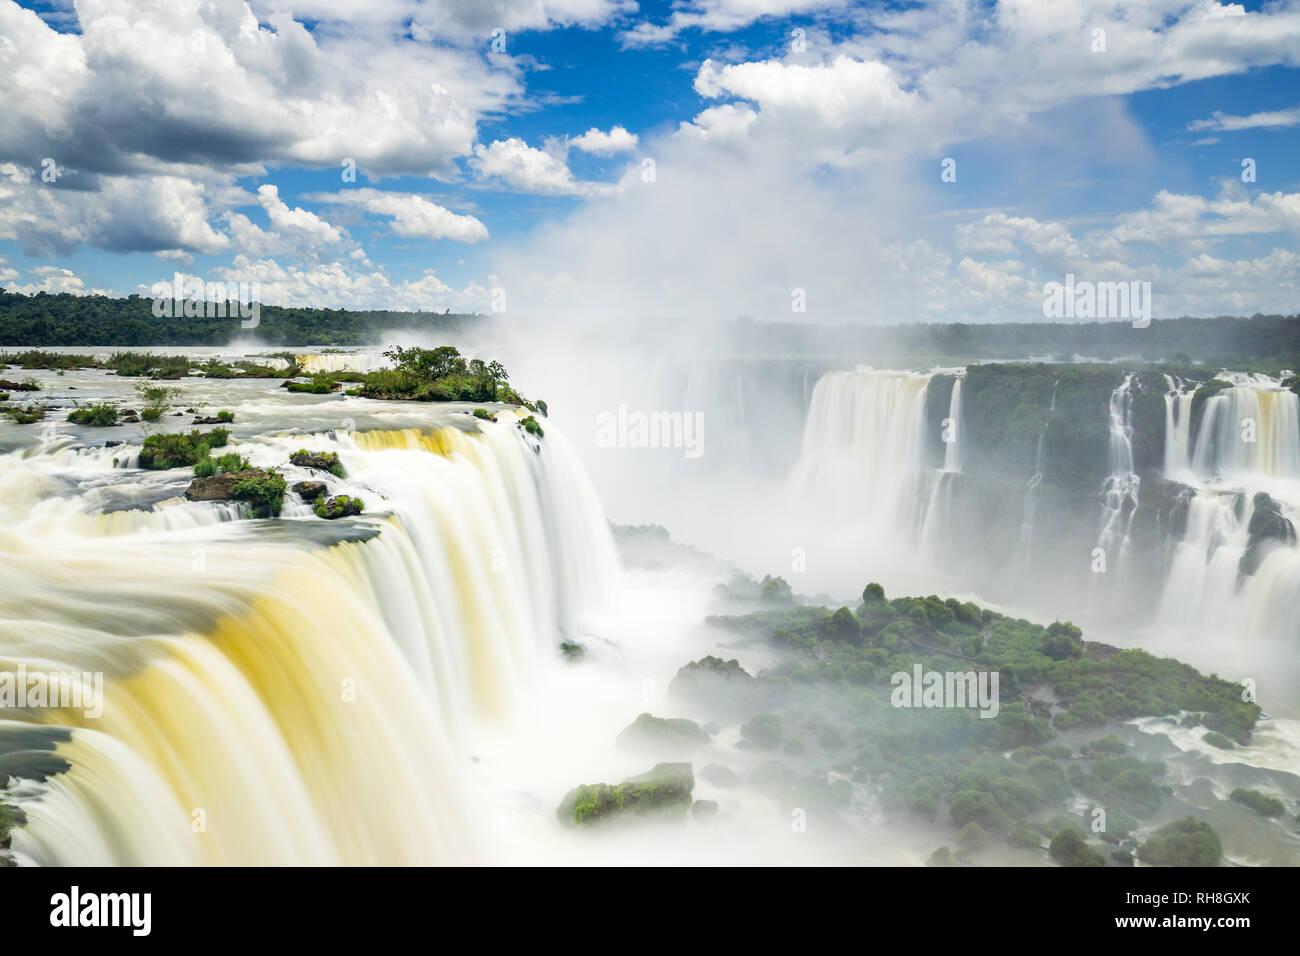 a long exposure panorama of the worldfamous Iguazu Falls on the Brazilian side. - Stock Image